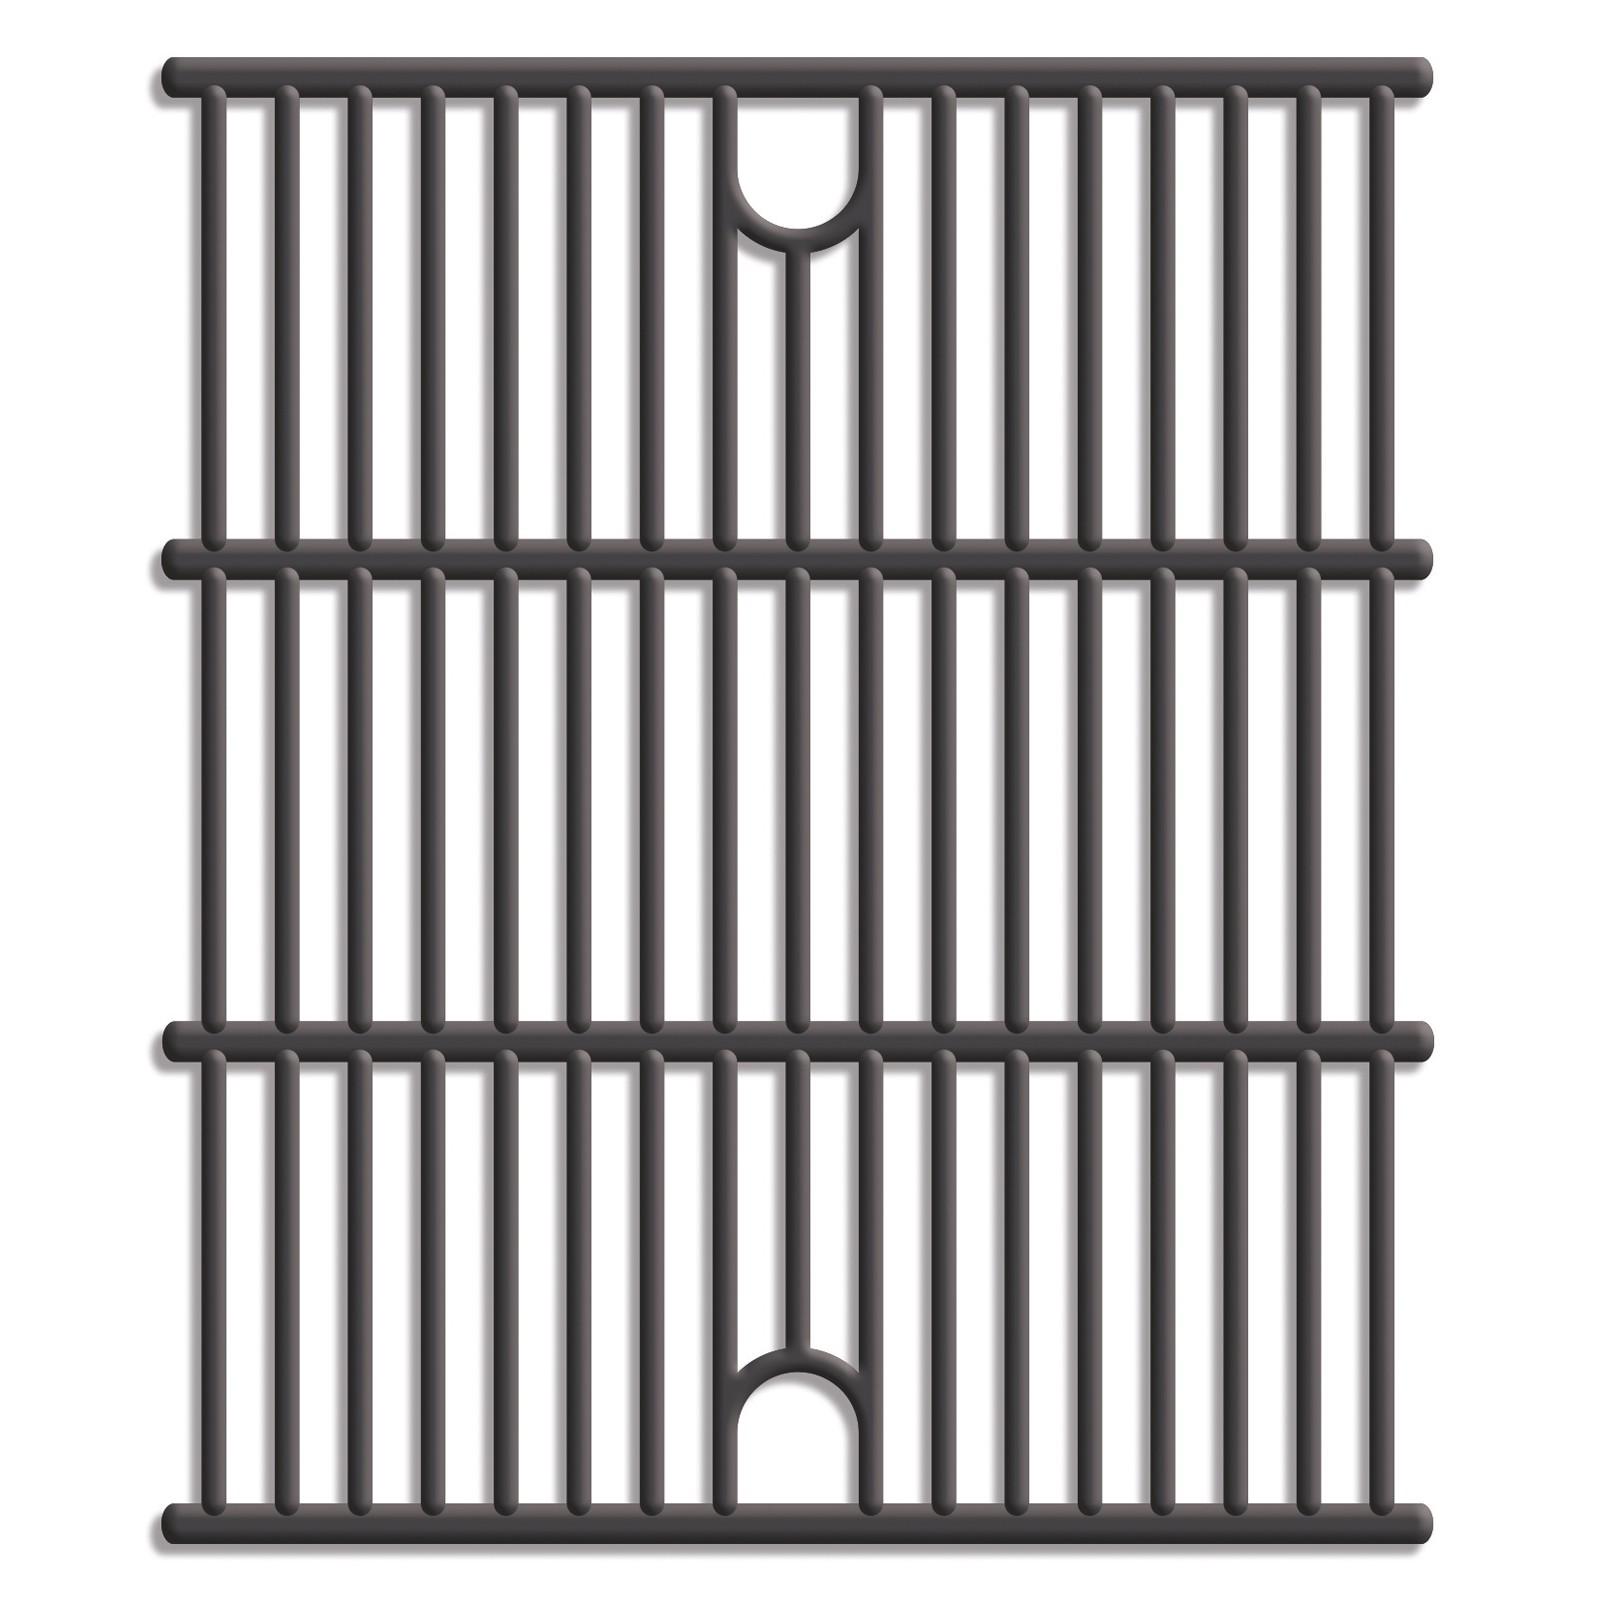 Tepro Universal Guss Grillrost Set 2 x ca. 36 x 40 cm 8589